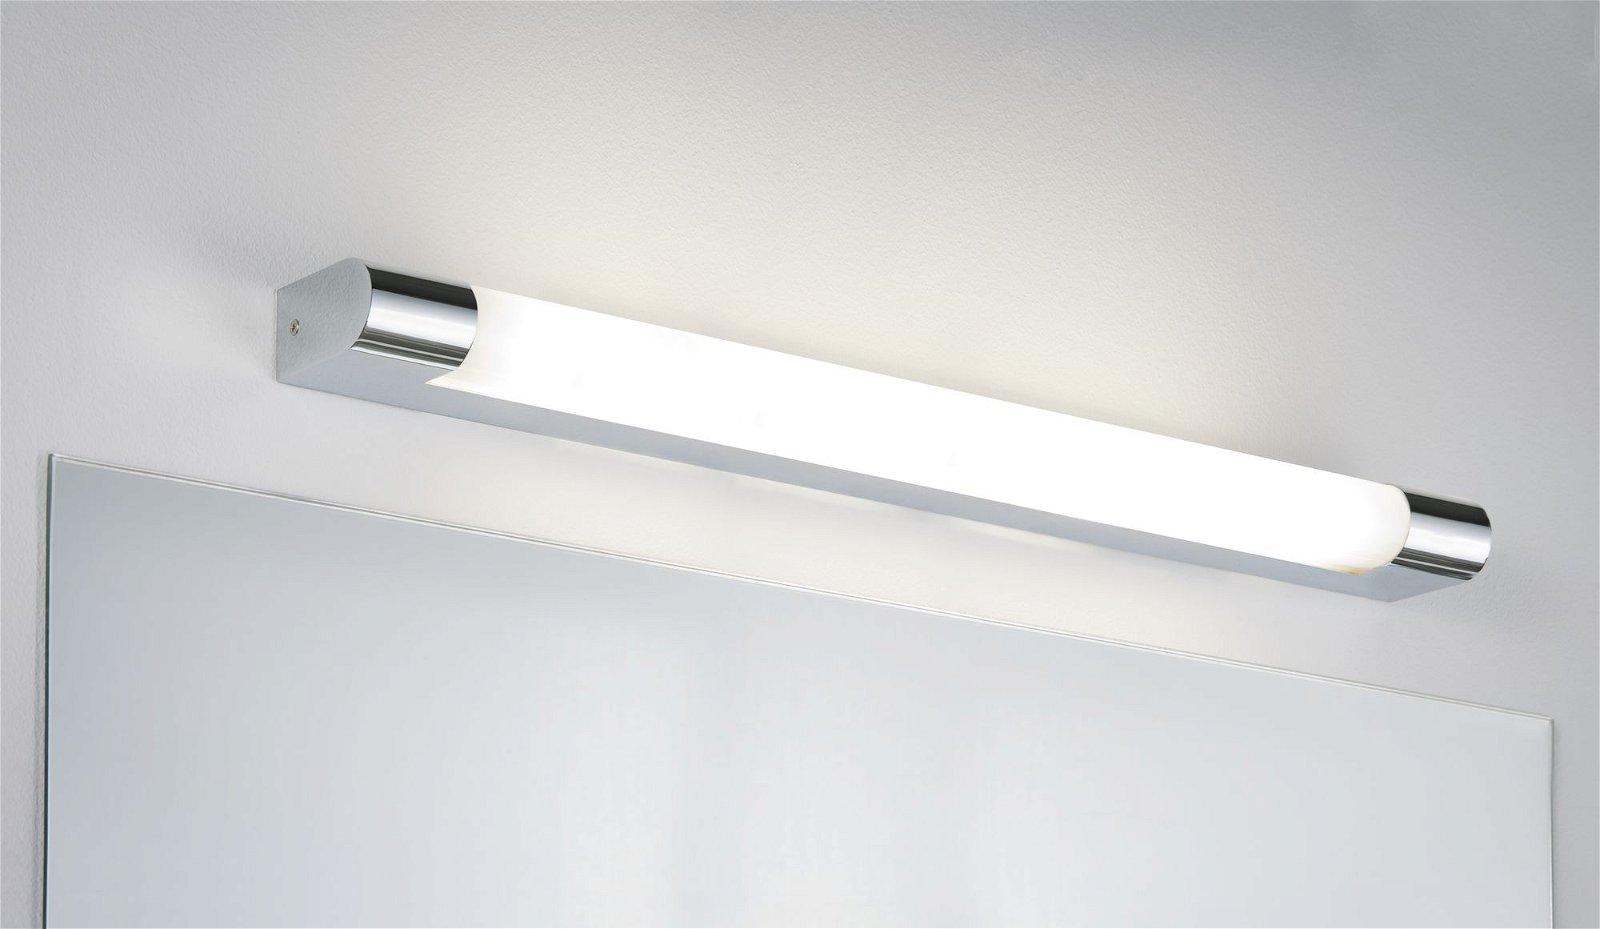 LED Spiegelleuchte Mizar IP44 3000K 1400lm 230V 10,5W Chrom/Weiß